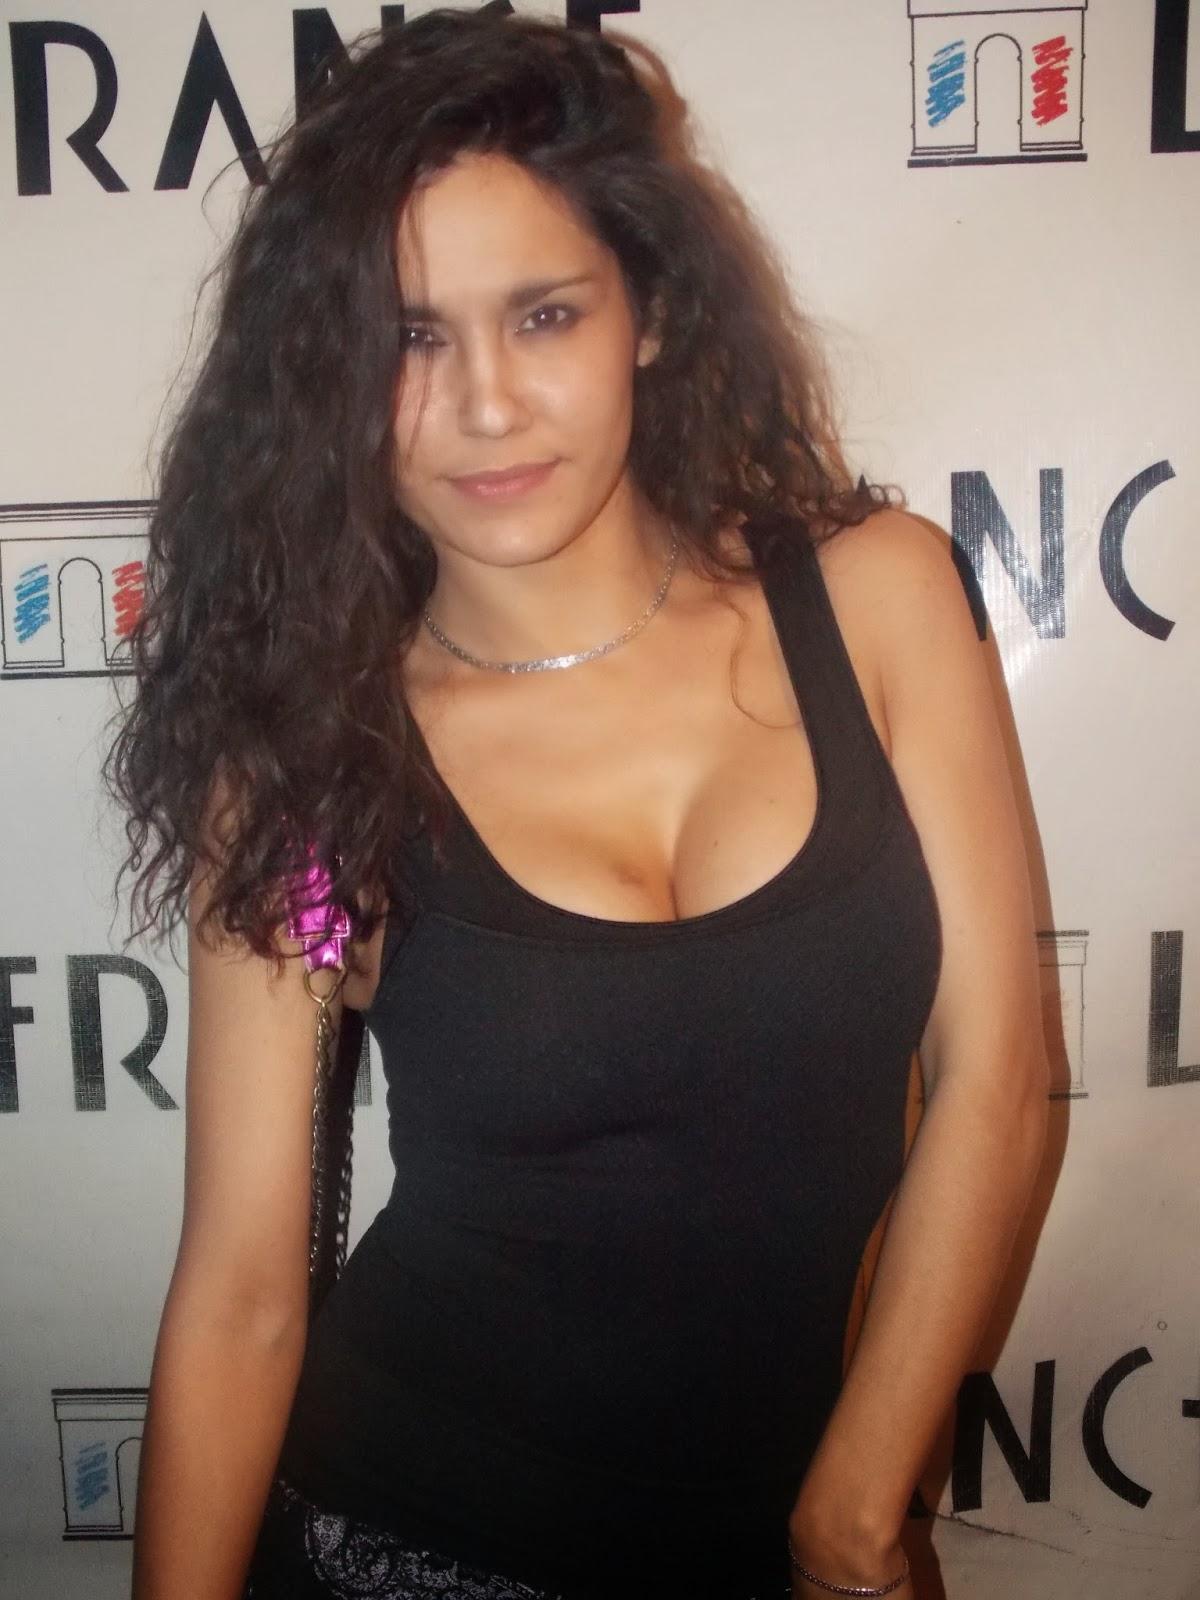 Chicas ecuatorianass video de luisana lopilato desnuda 26